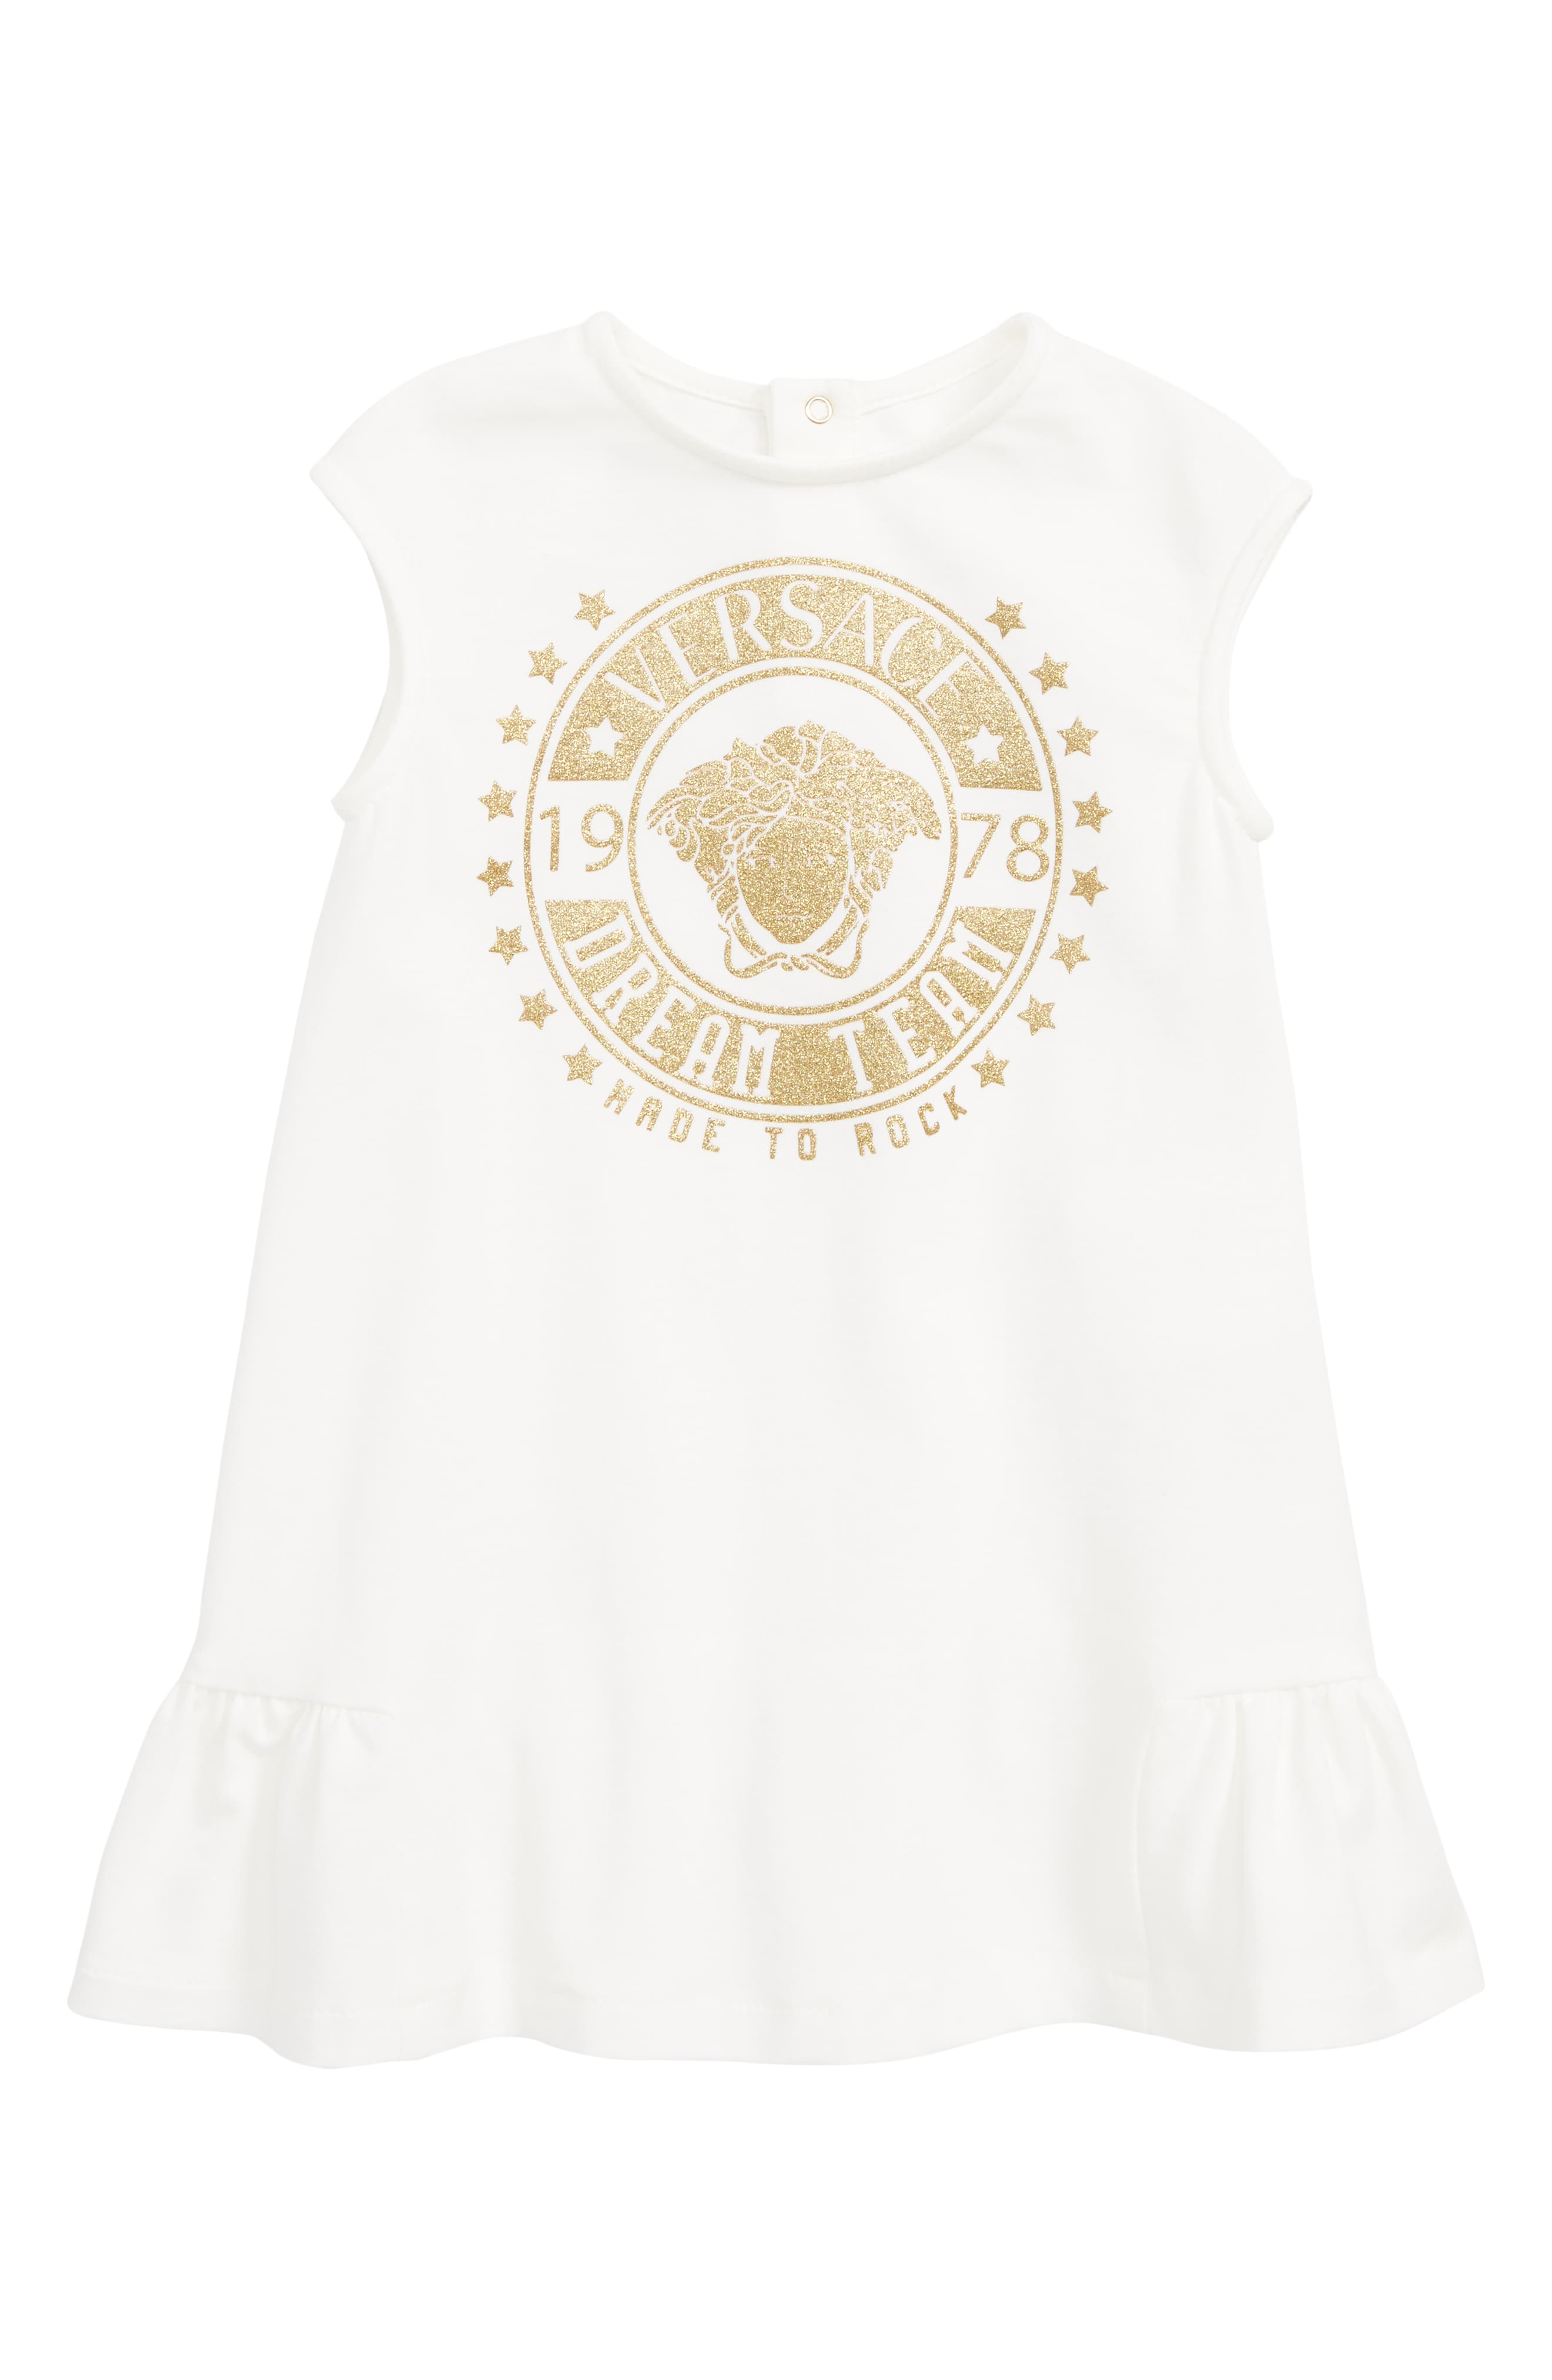 5ec55218 Infant Girl's Versace Logo Patch Sleeveless Dress, Size 24M - White ...